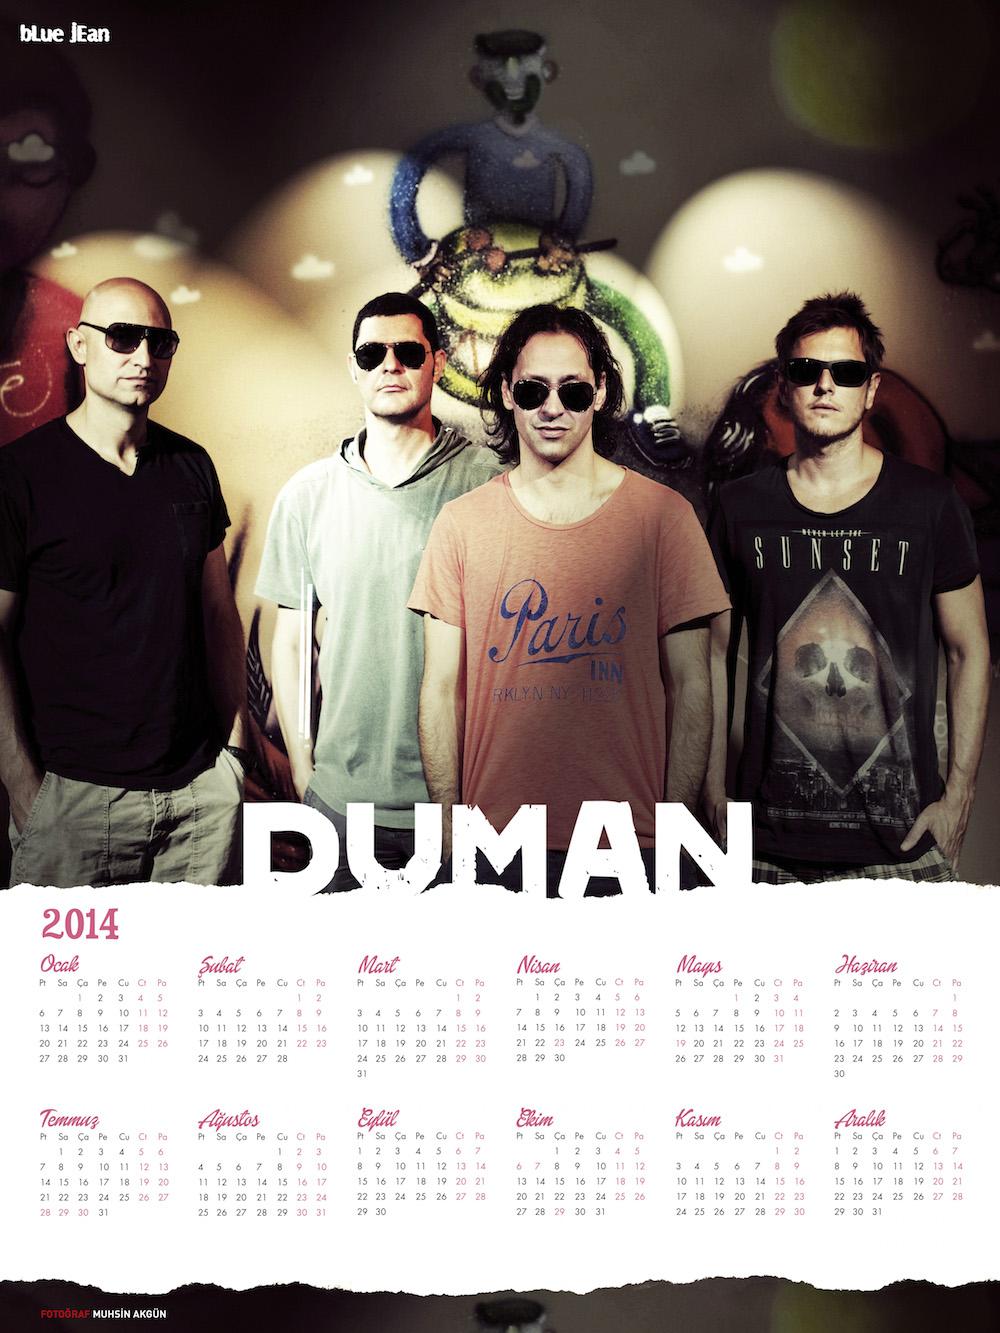 duman-bluejean2014ocak.jpg